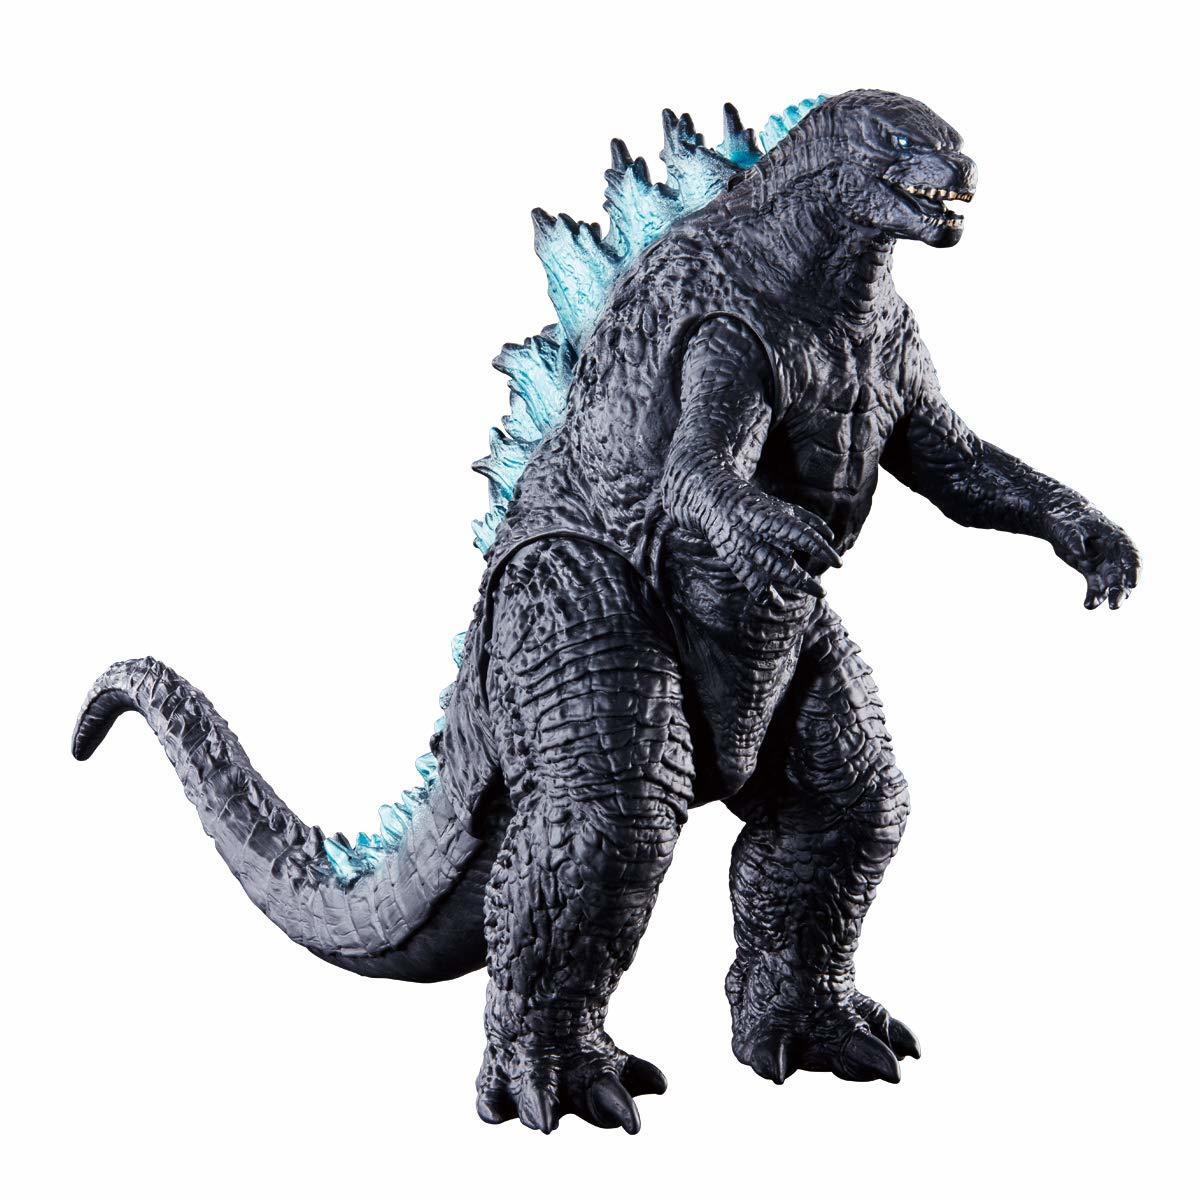 Movie Monster Series: Godzilla 2019 - Soft Vinyl figure image